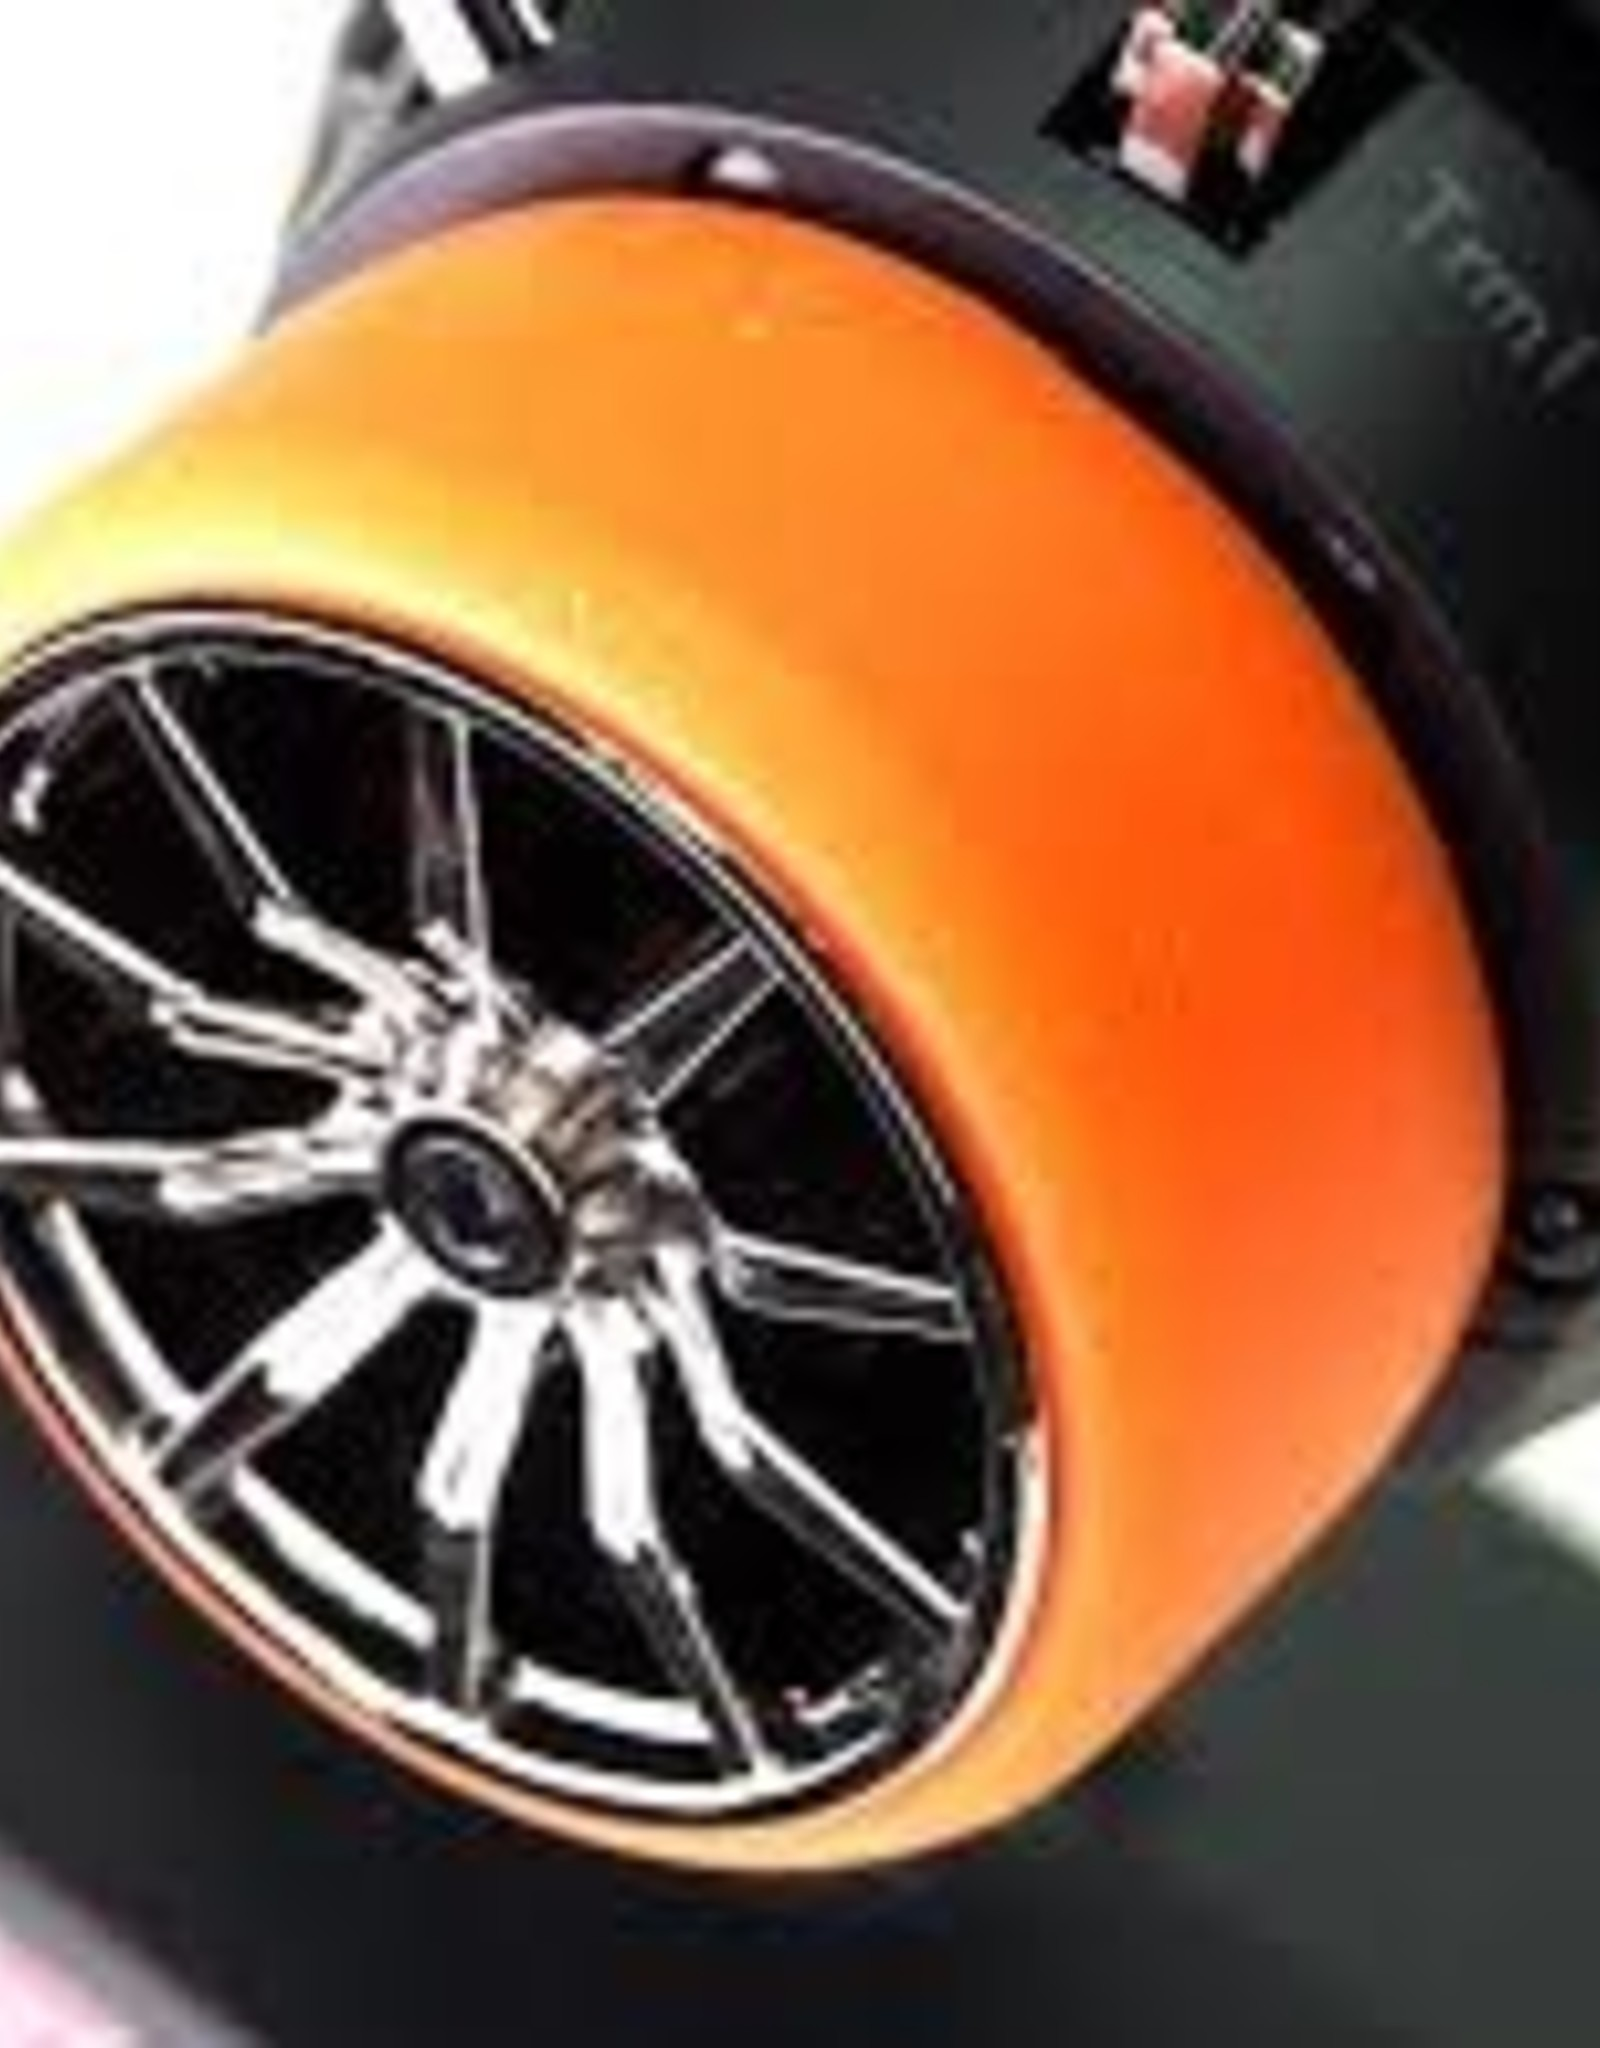 Pn Racing PN Racing Universal Transmitter Steering Wheel Grip (Orange)